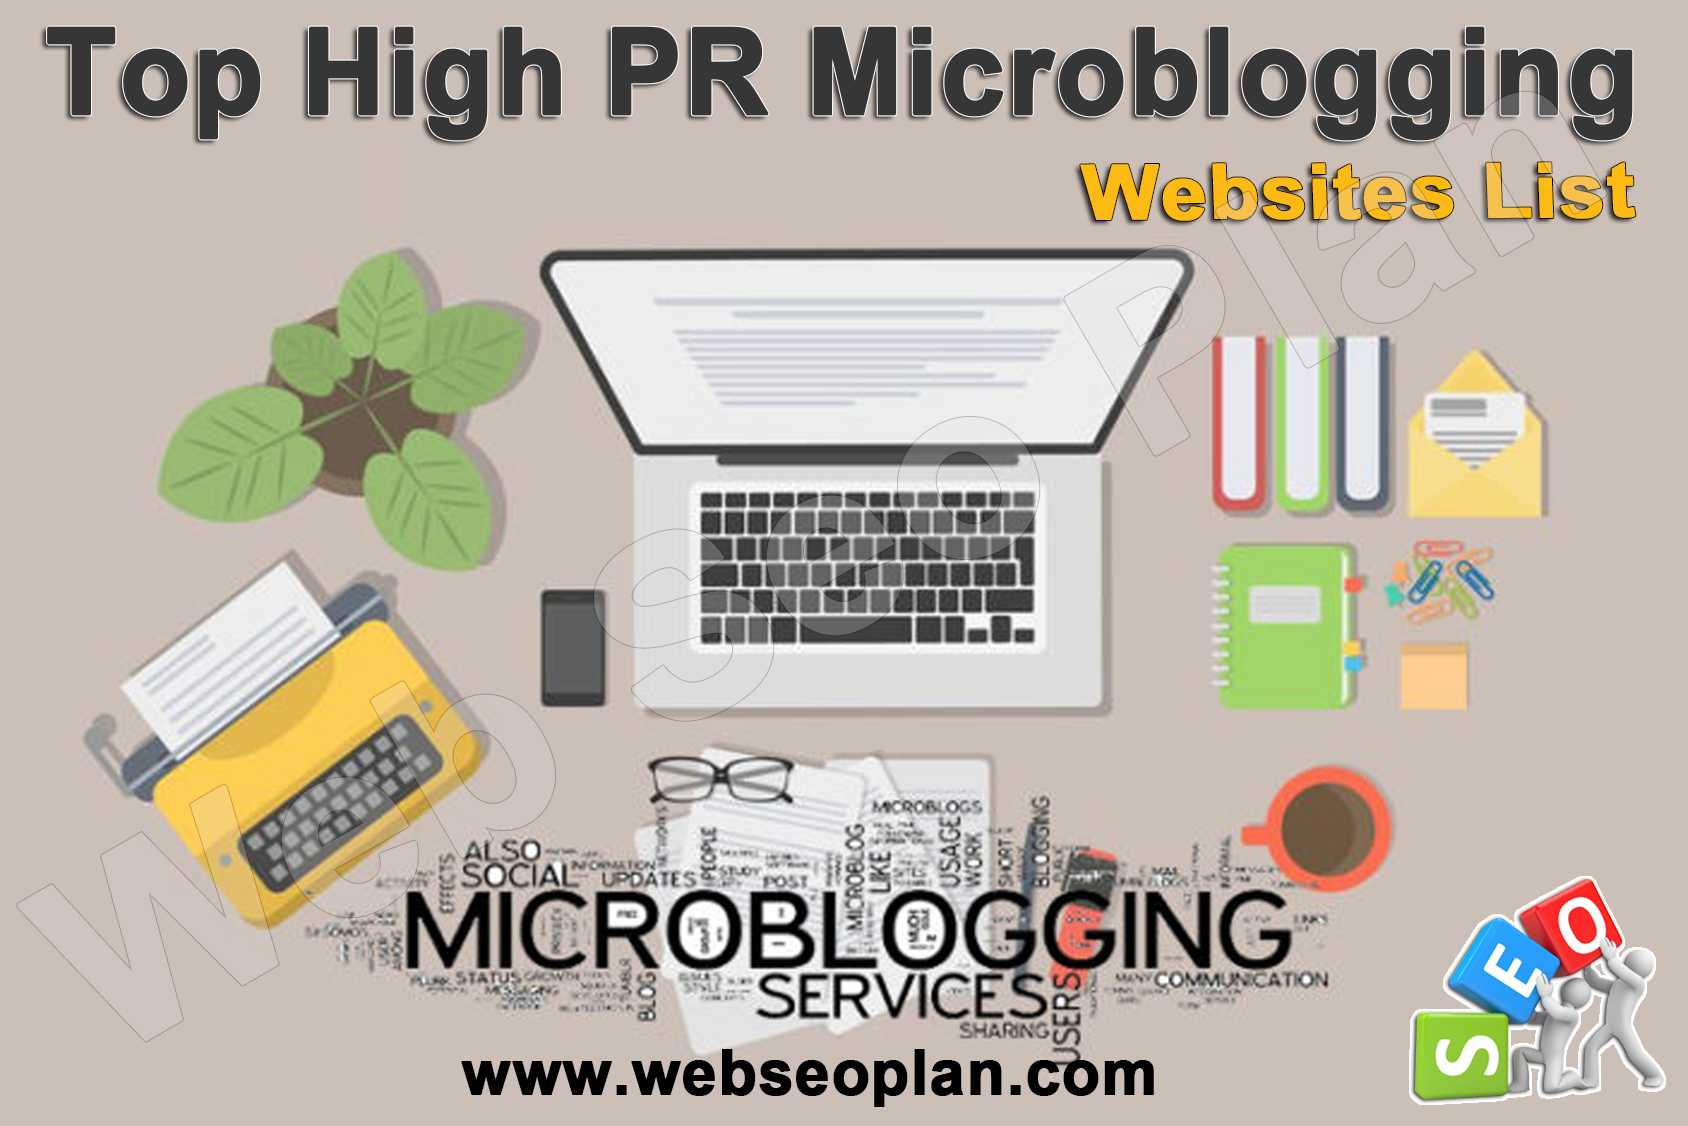 Top Free High PR Microblogging Sites List